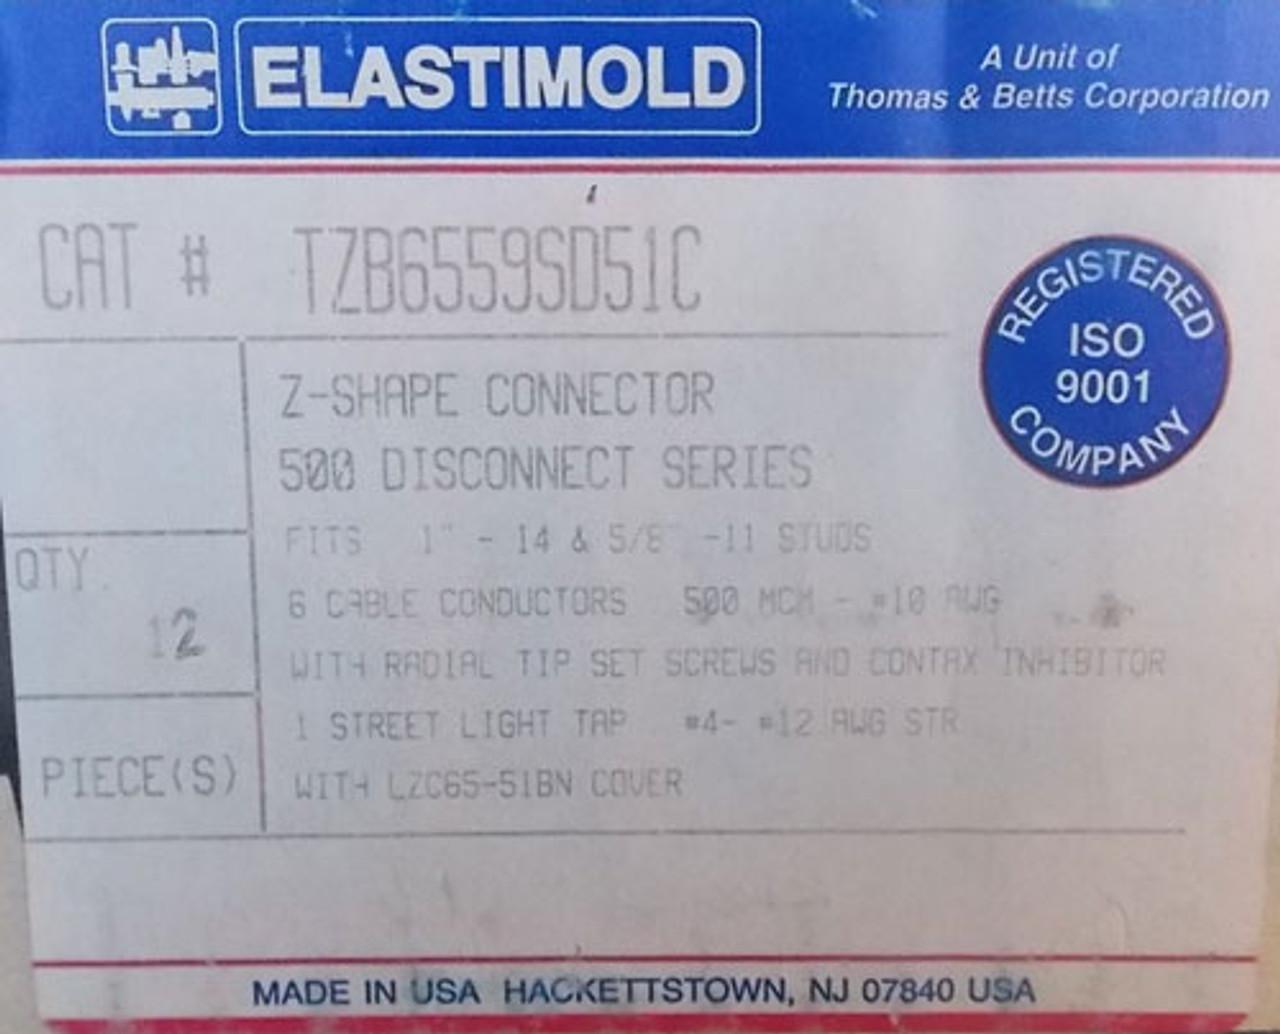 Elastimold TZB6559SD51C Z-Shape Connector 6 Port 500 MCM 10 AL-CU